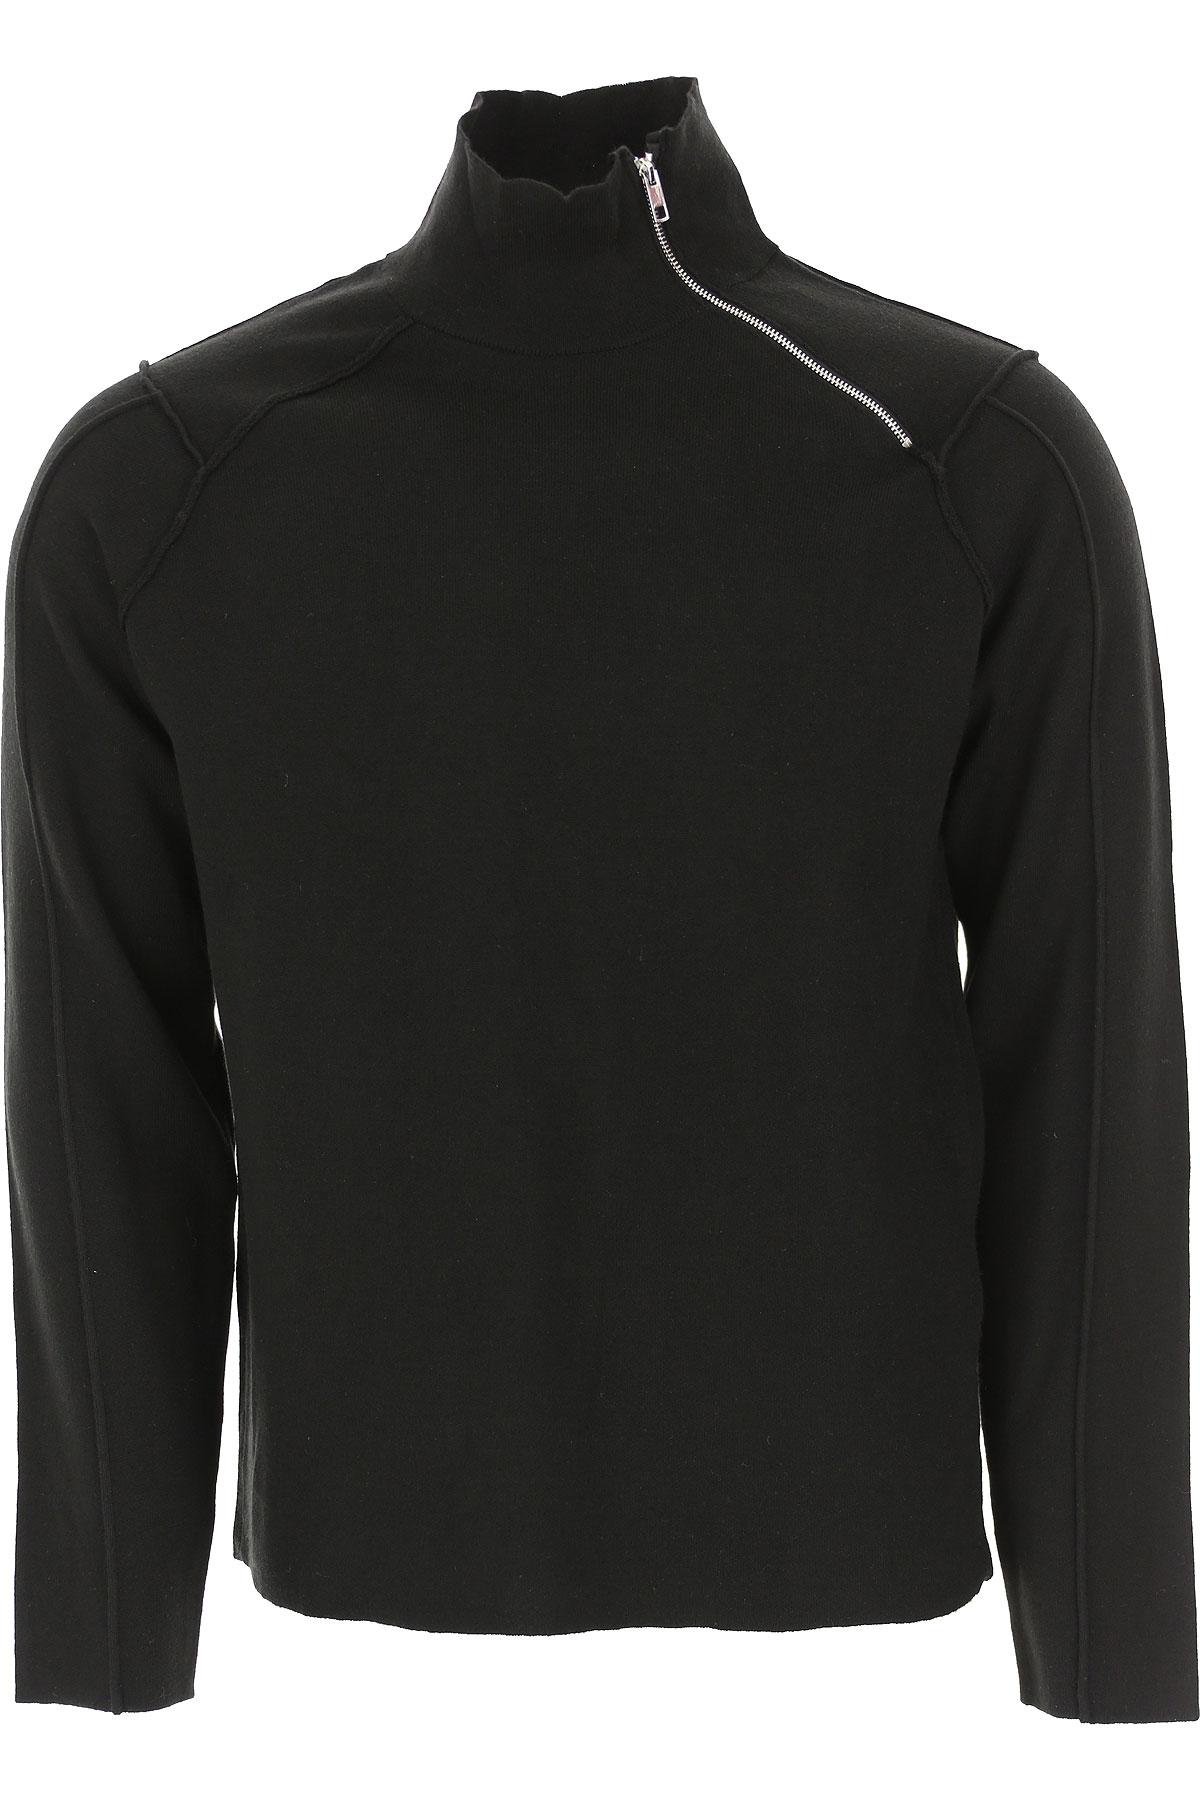 Antony Morato Sweater for Men Jumper On Sale, Black, polyamide, 2019, M S XXL